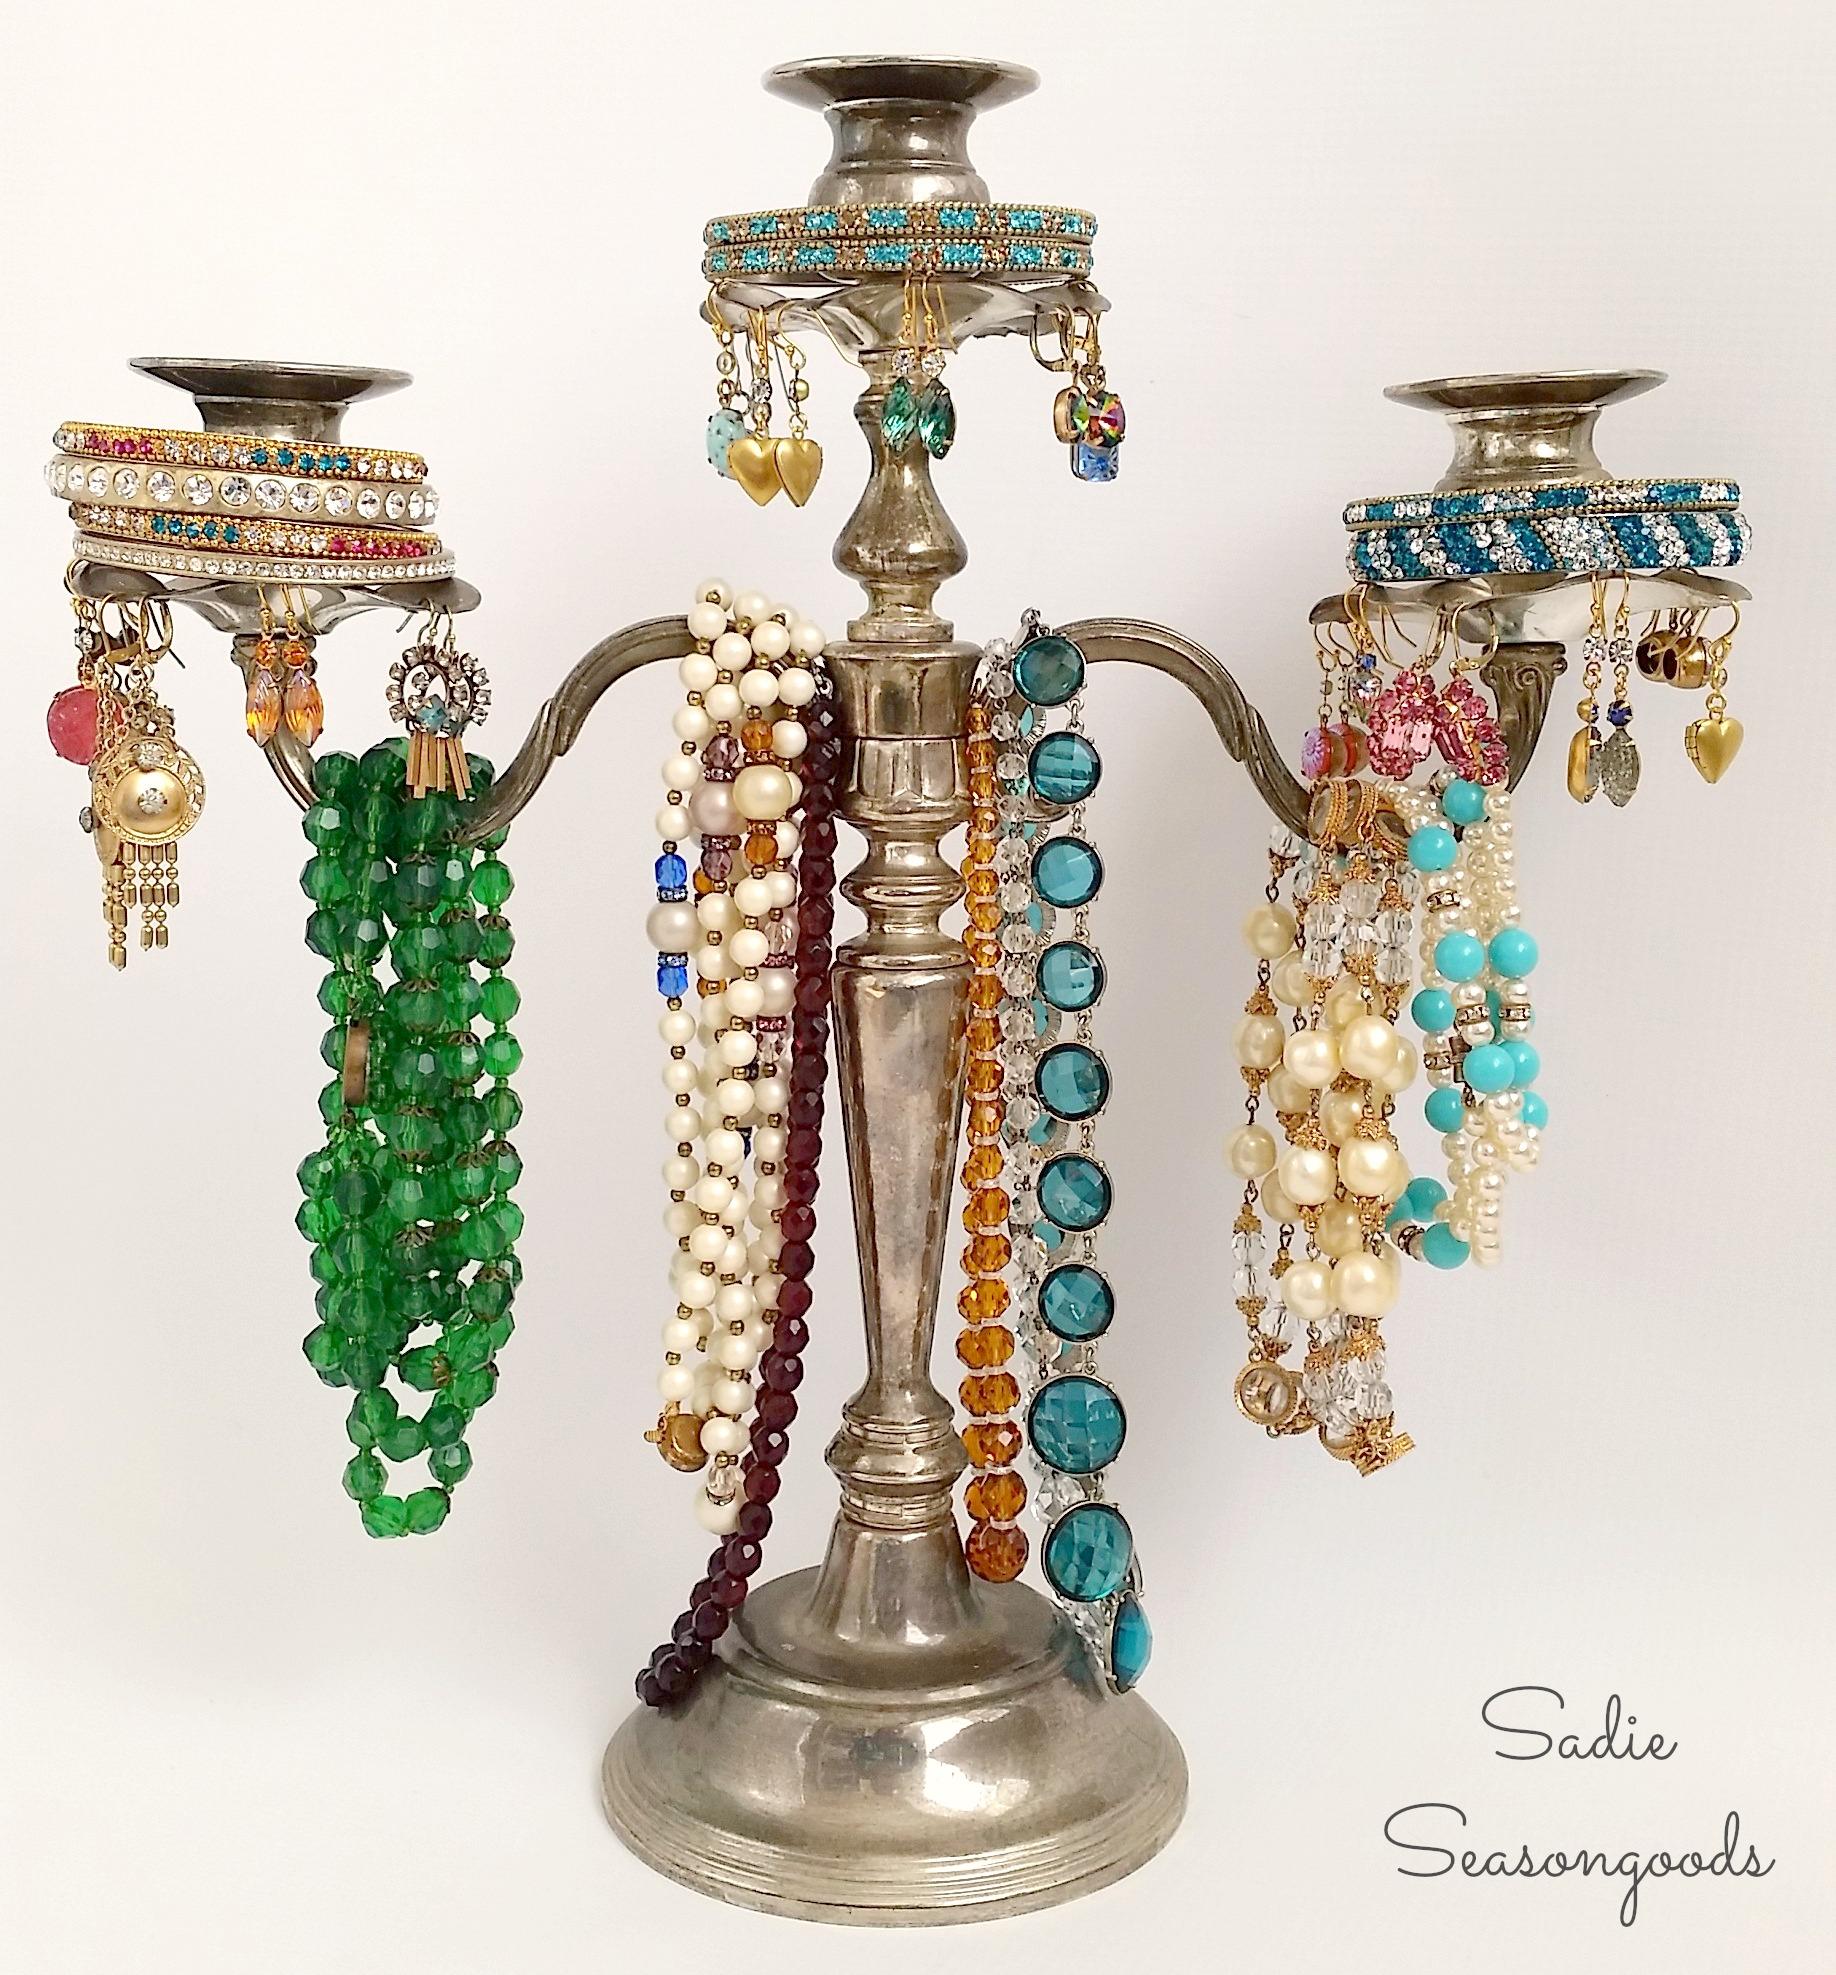 Sadie_Seasongoods_thrifted_silver_candelabra_jewelry_tree-1